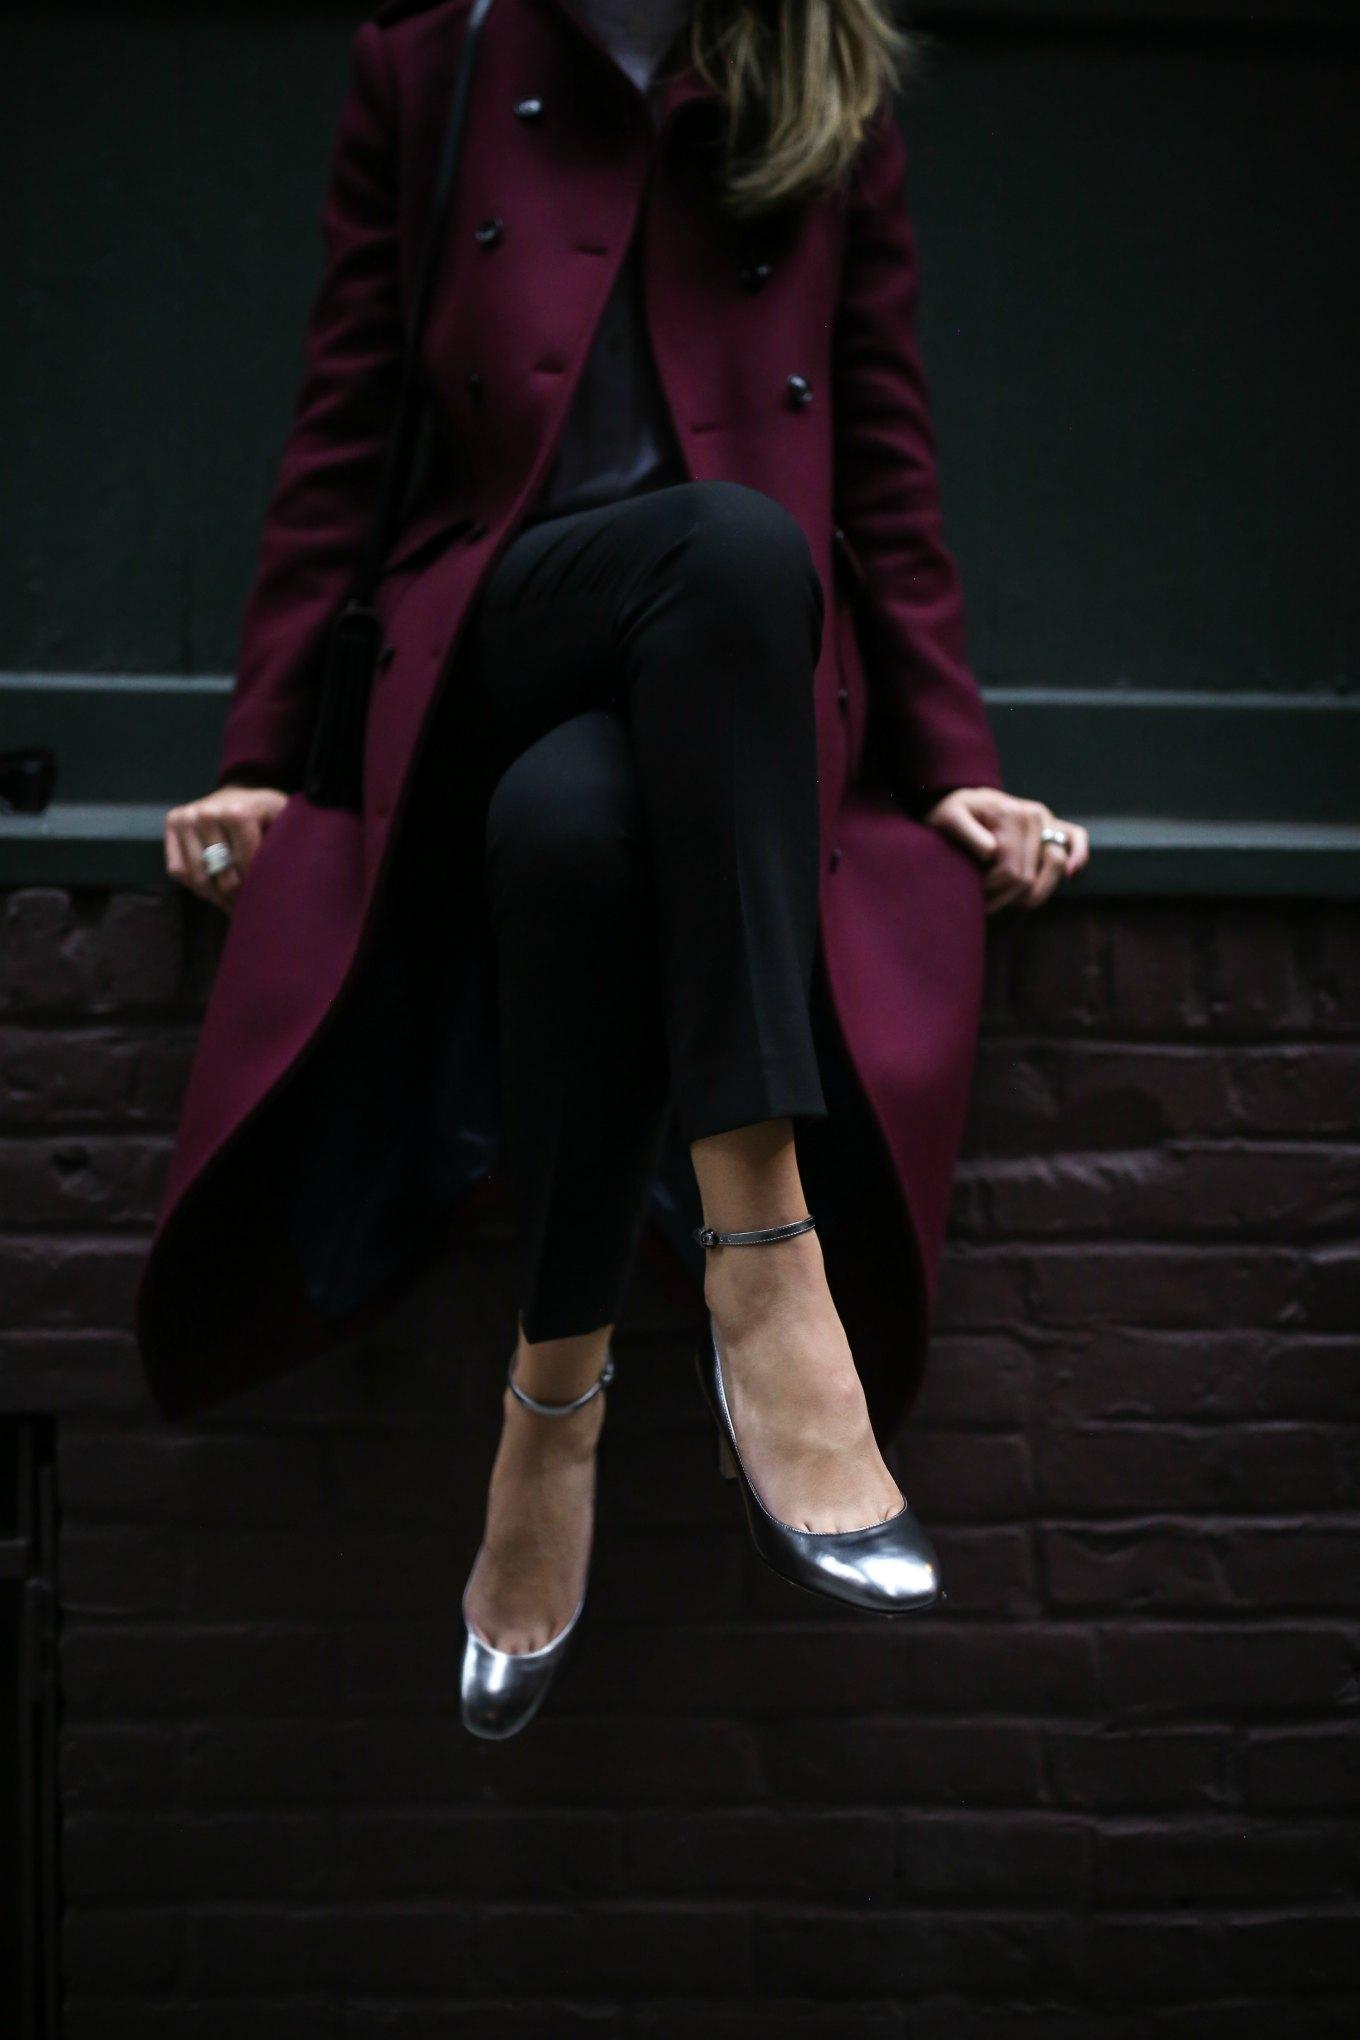 Mary Orton of Memorandum blog wears black tailored pants, long burgundy coat, white ruffle blouse, metallic block heel mary jane pumps and a black saint laurent bag